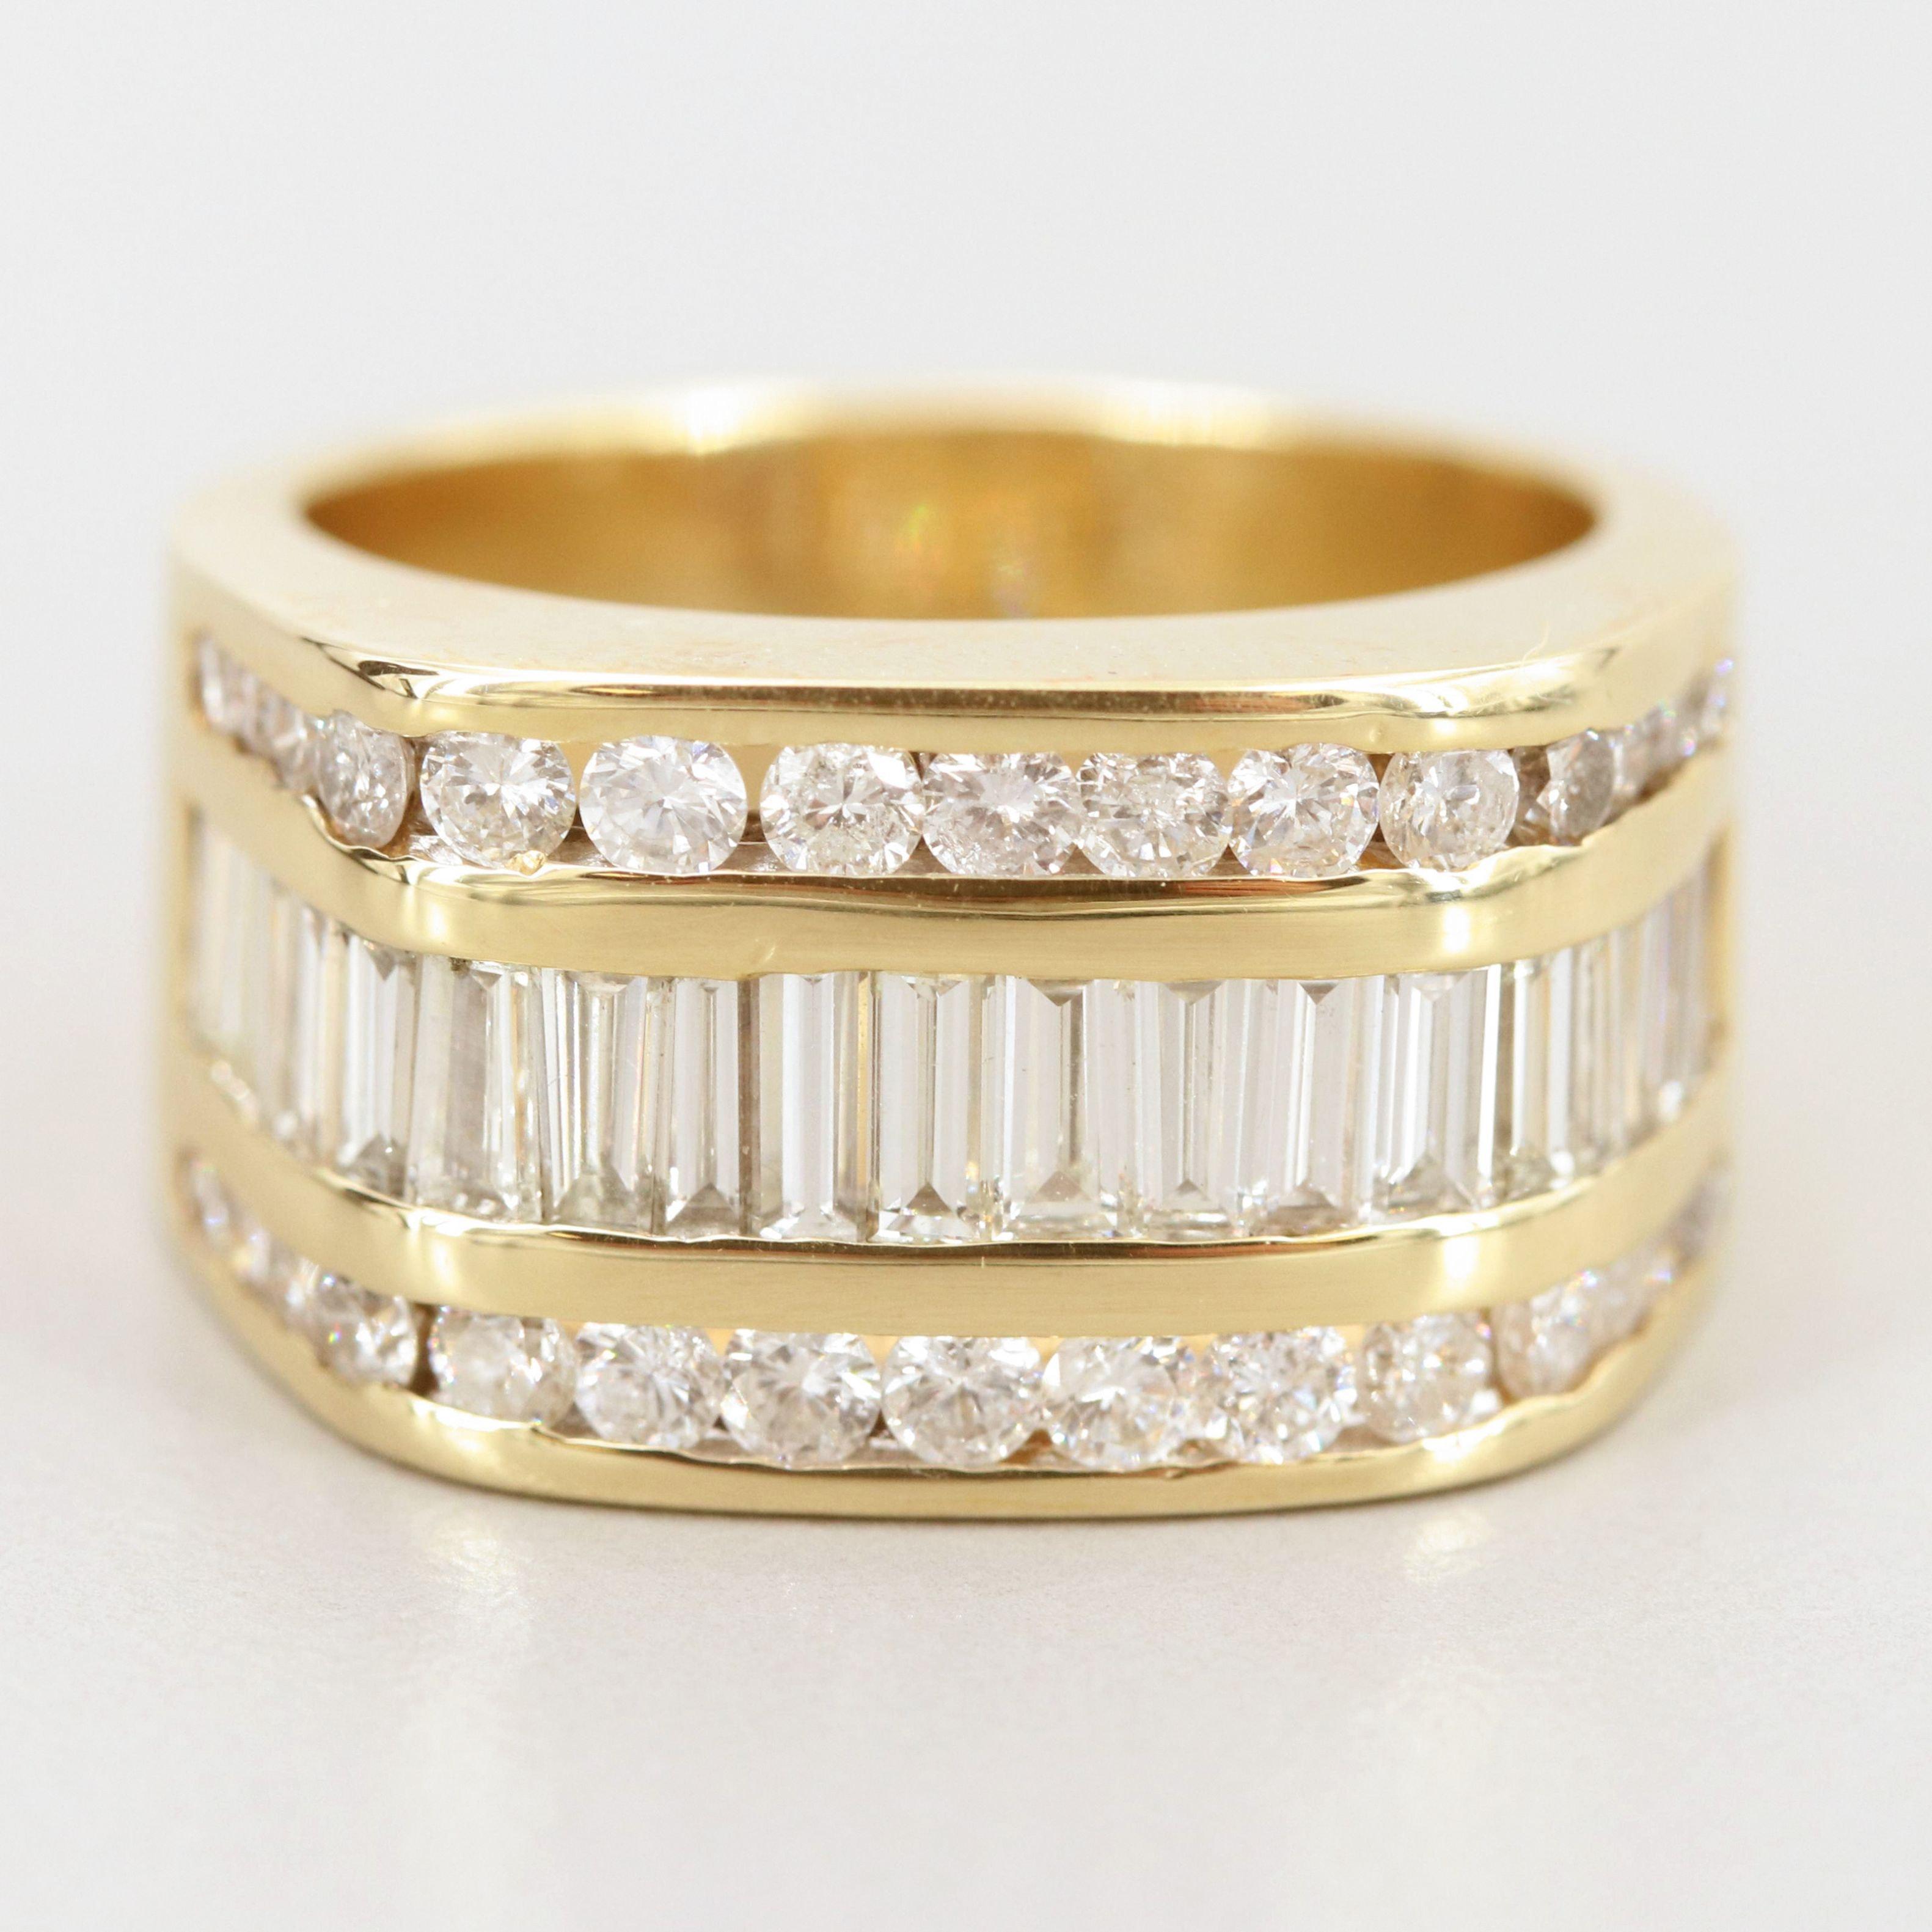 14K Yellow Gold 2.73 CTW Diamond Ring